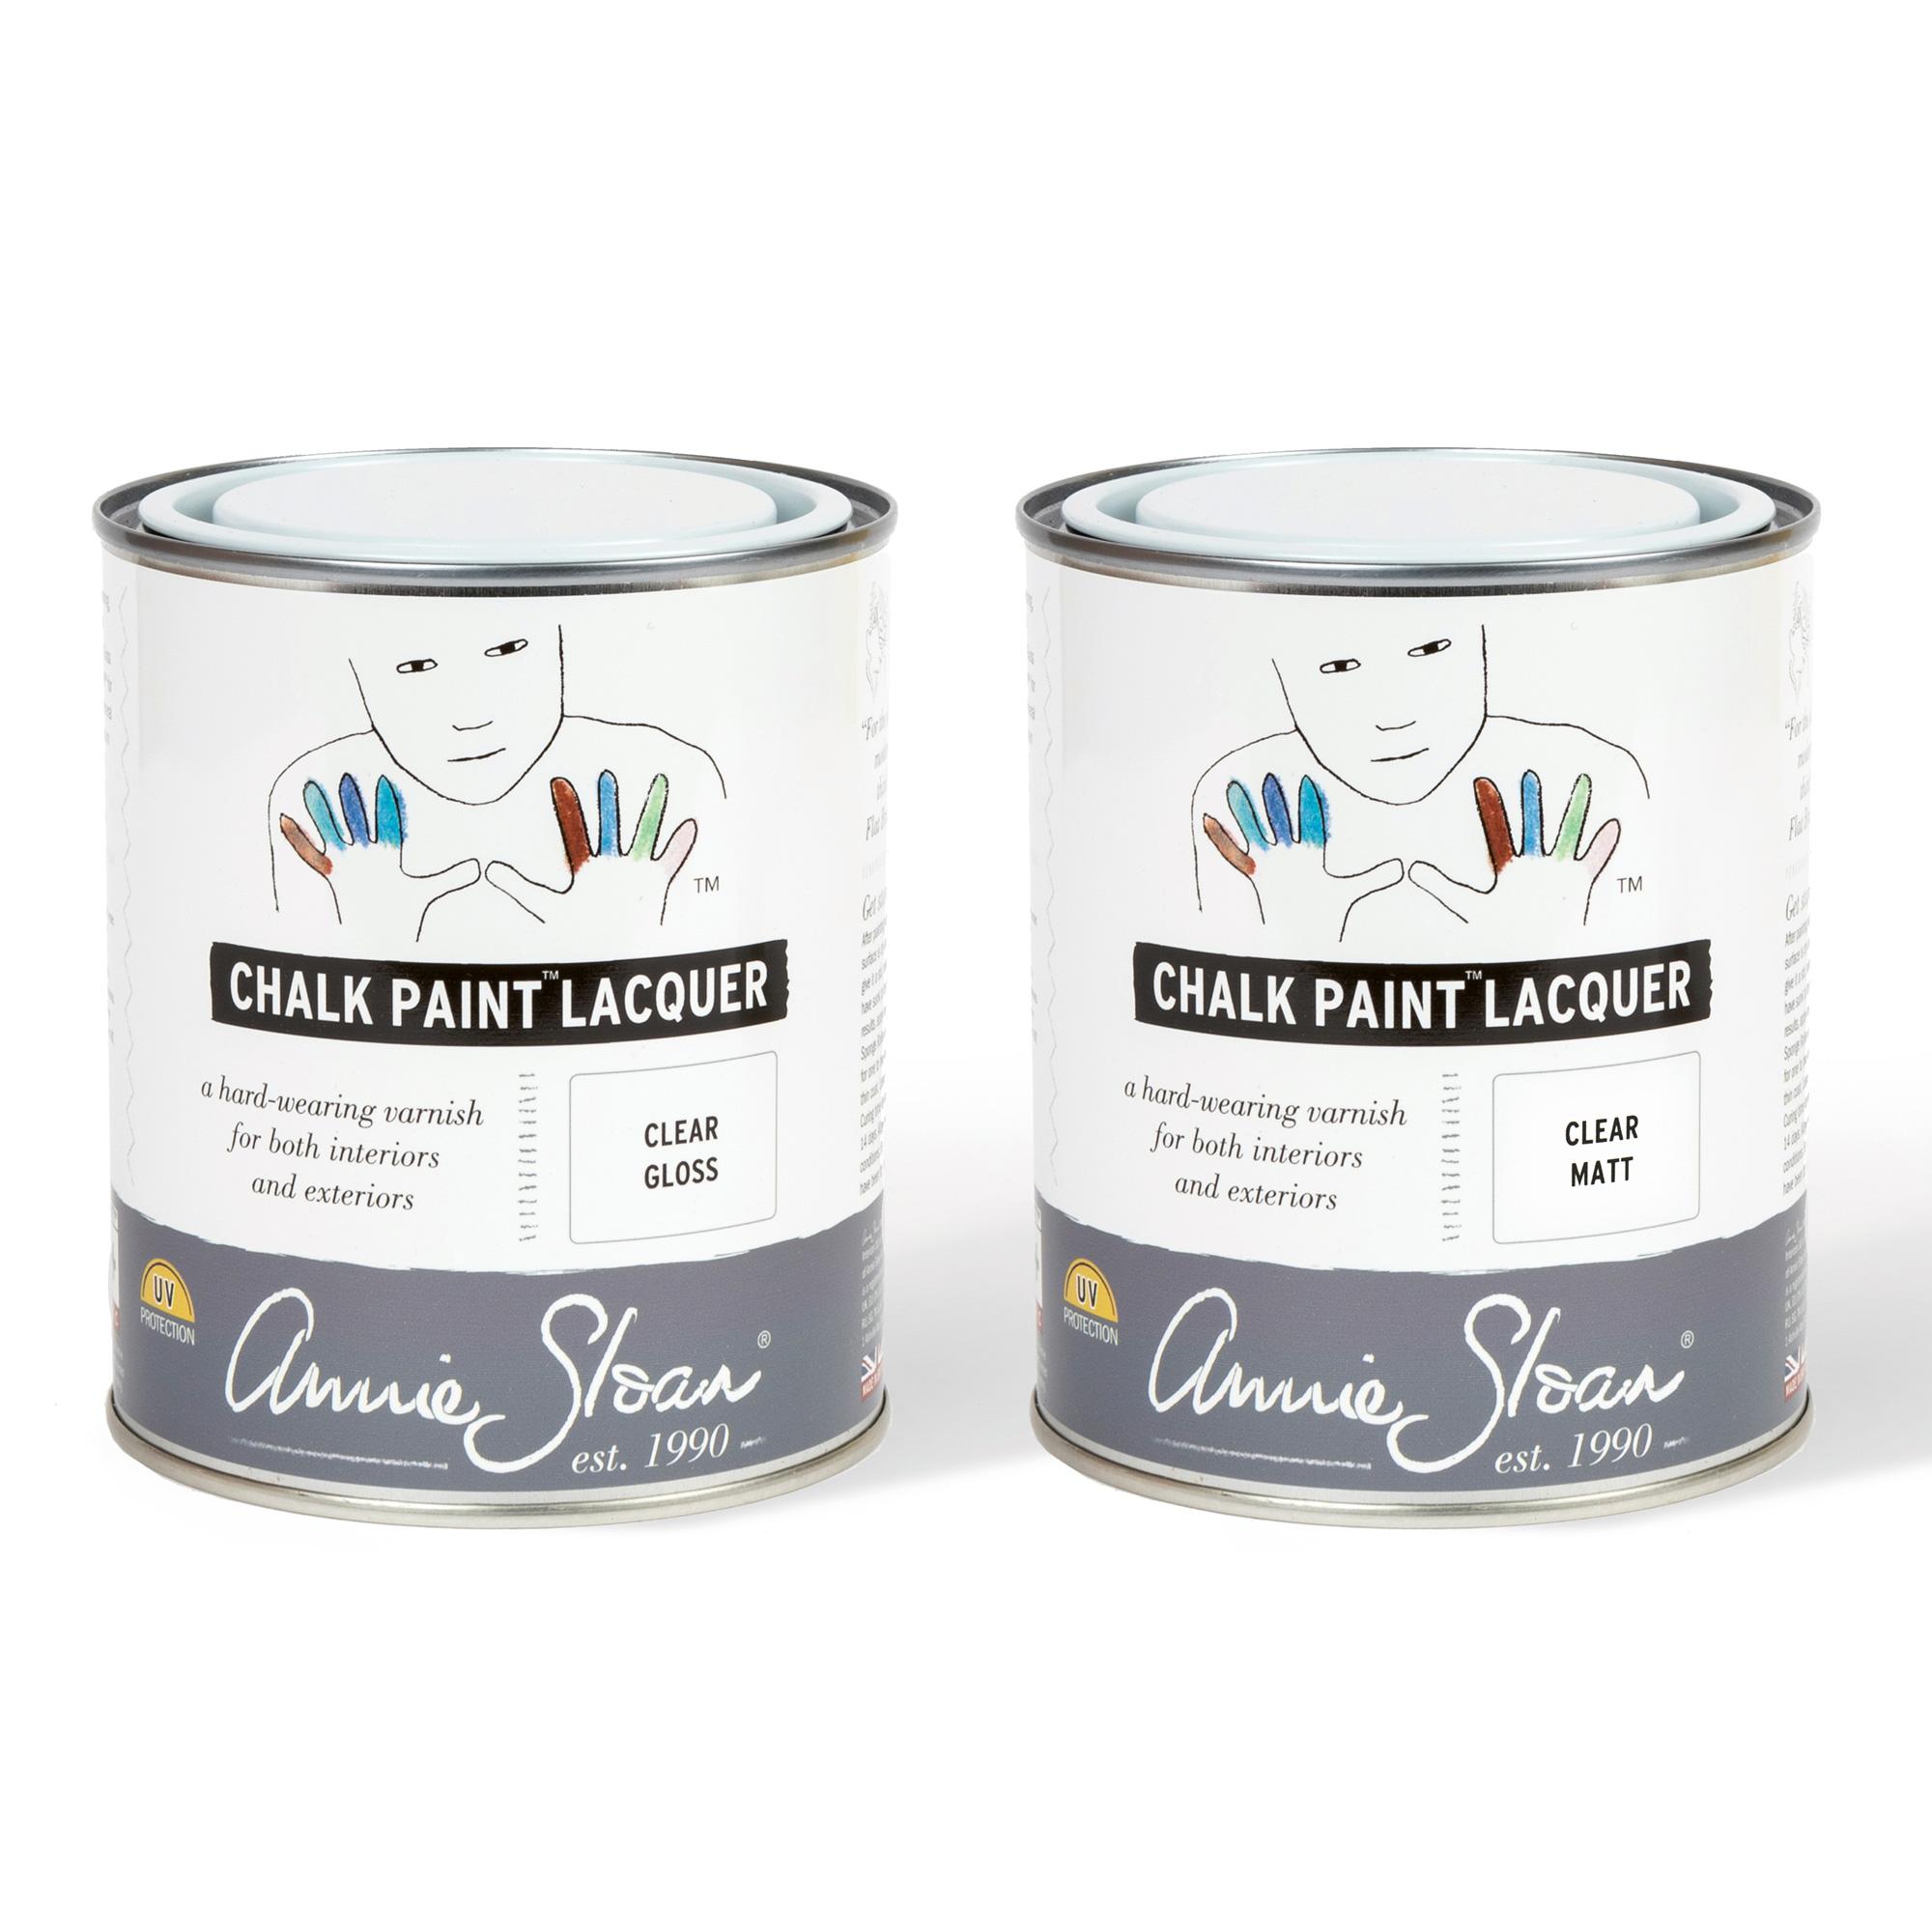 Annie Sloan Chalk Paint® Lacquer 750ml tin in Matt and Gloss